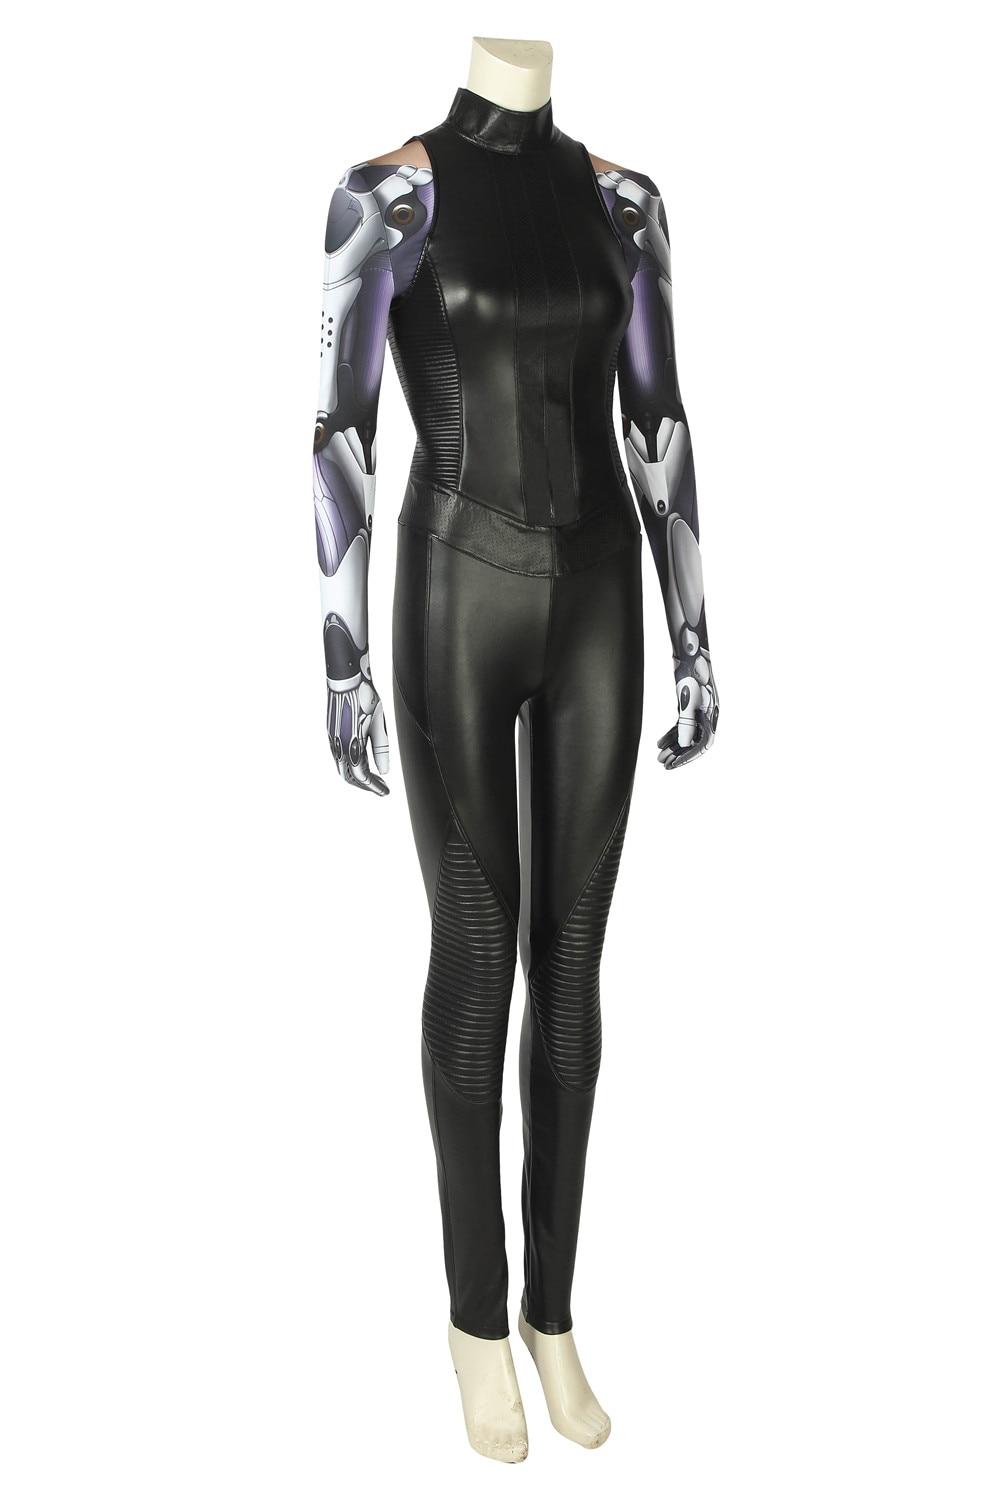 Battle Angel Women One Set Spandex Jumpsuit Tight Suit Cosplay Costume Alita